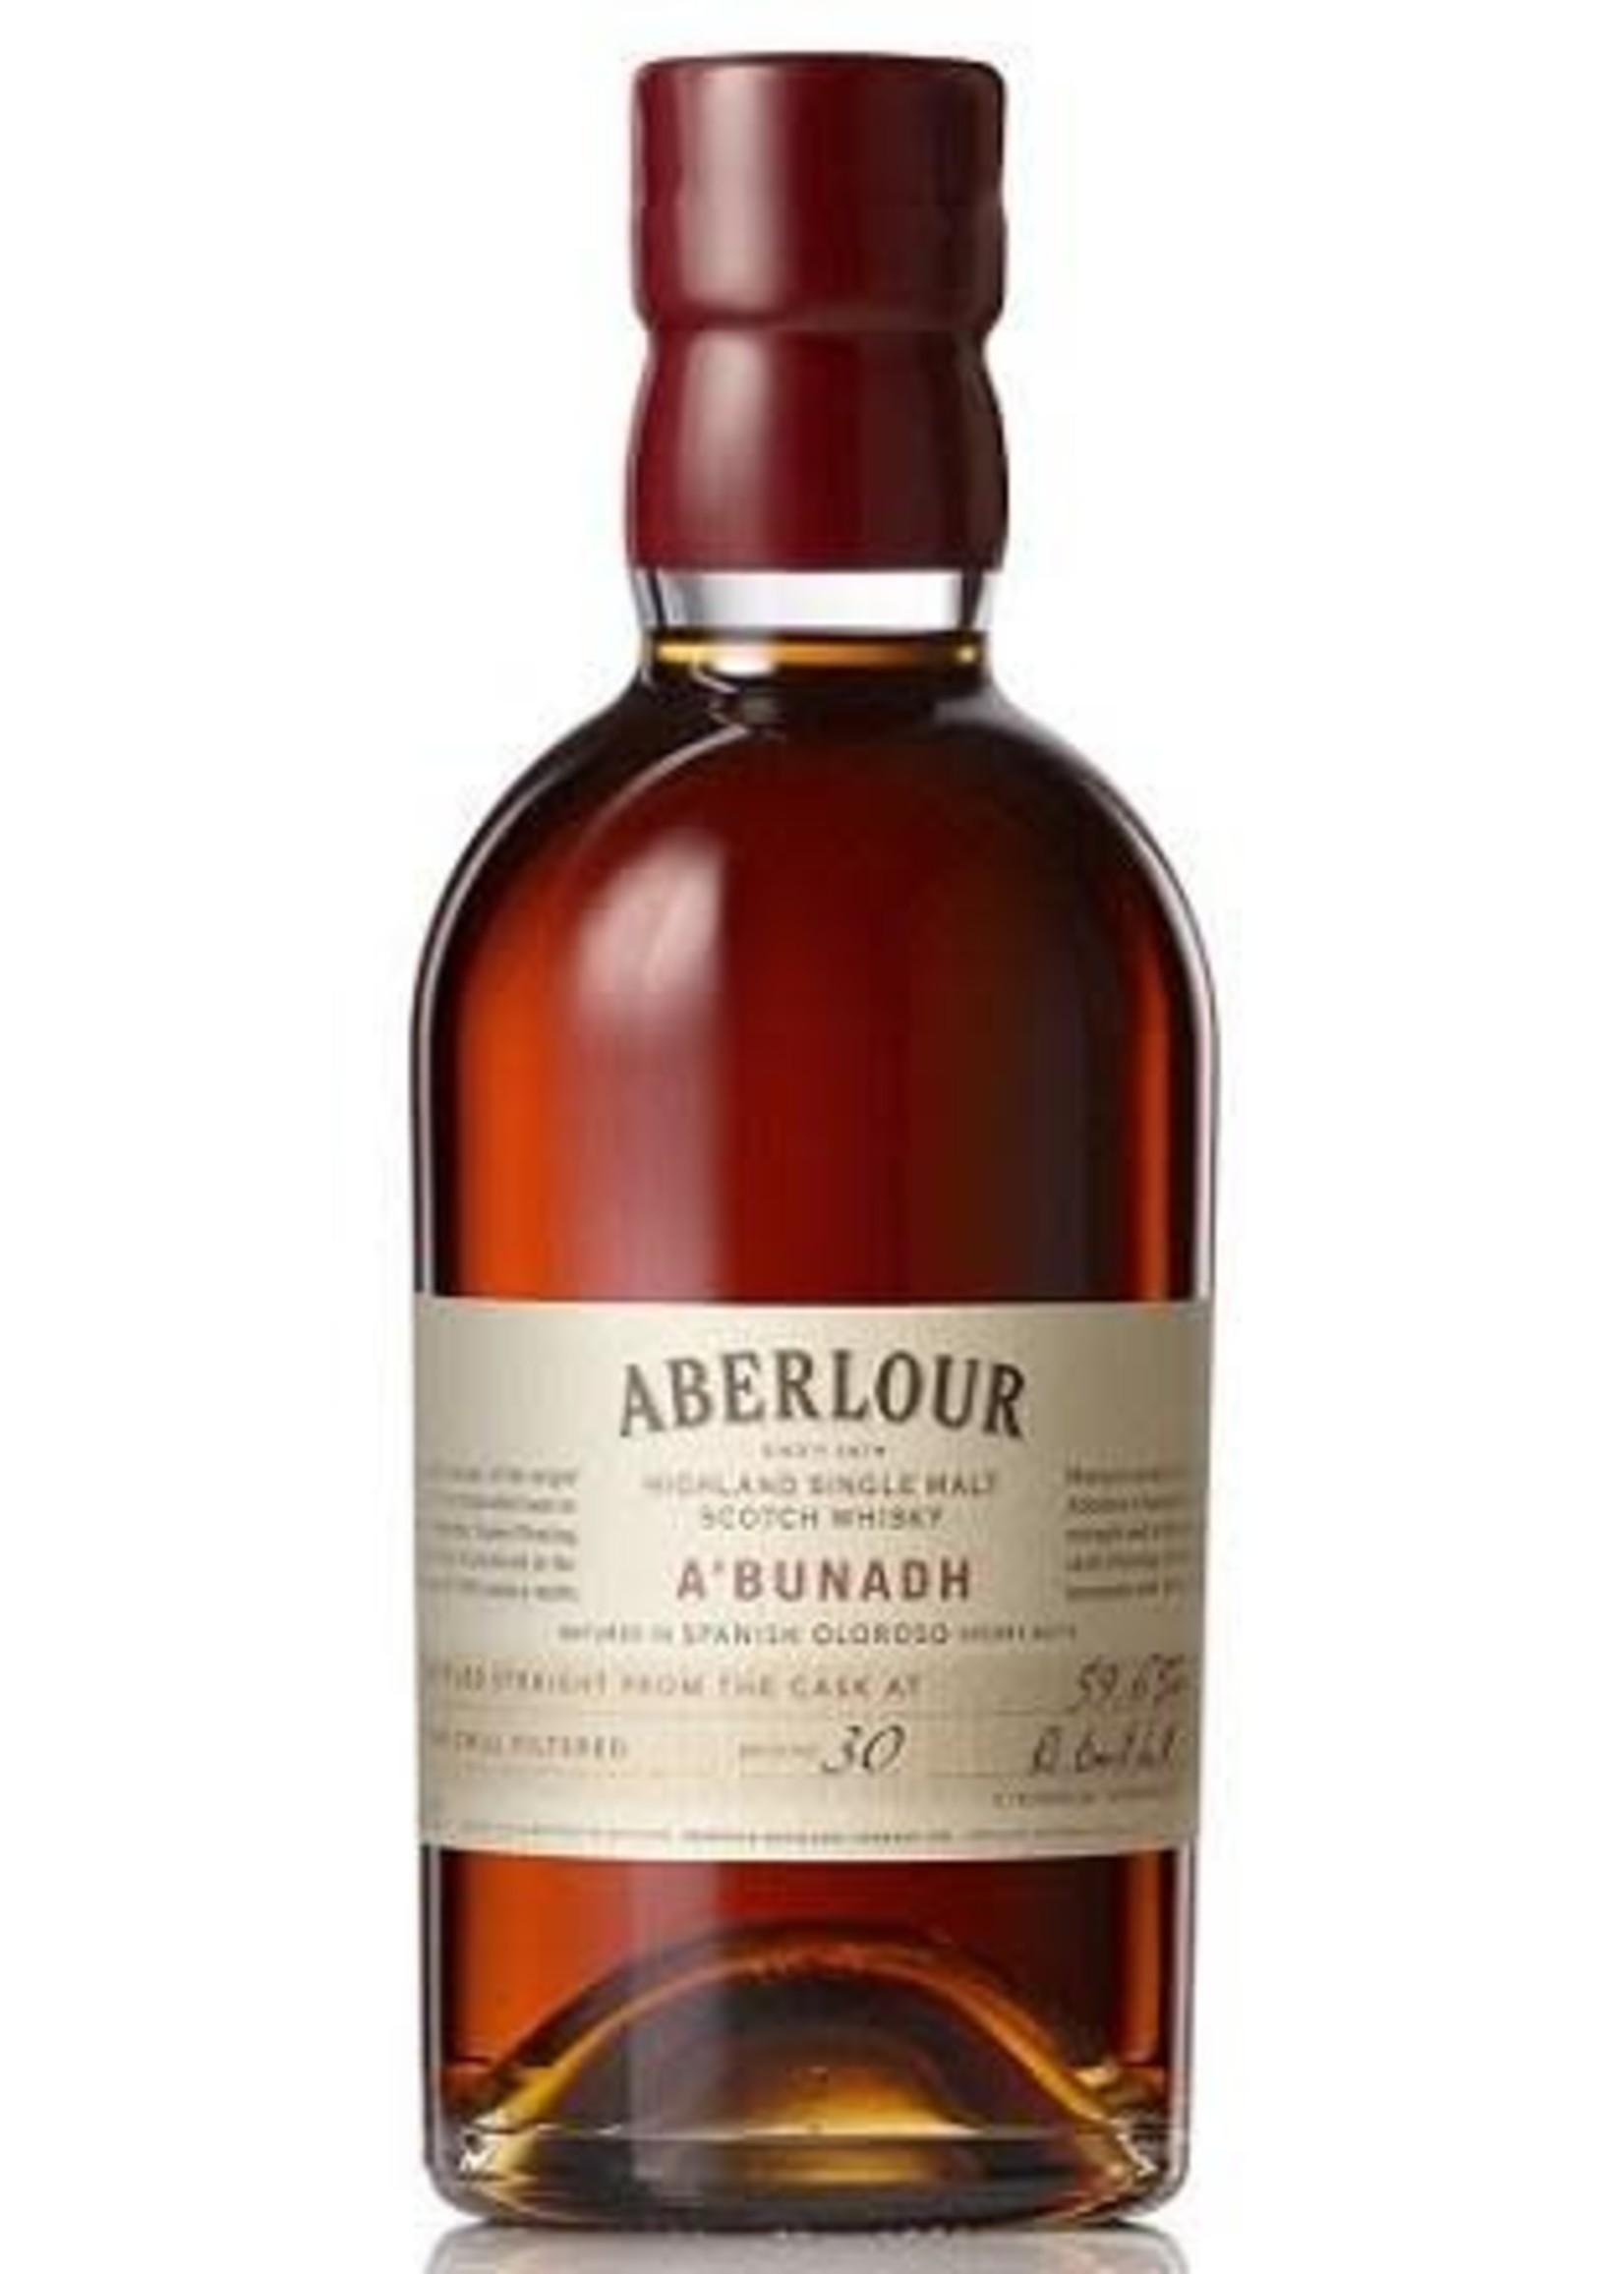 Aberlour Aberlour / A'Bunadh  Cask Strength Single Malt Scotch Whisky / 750mL